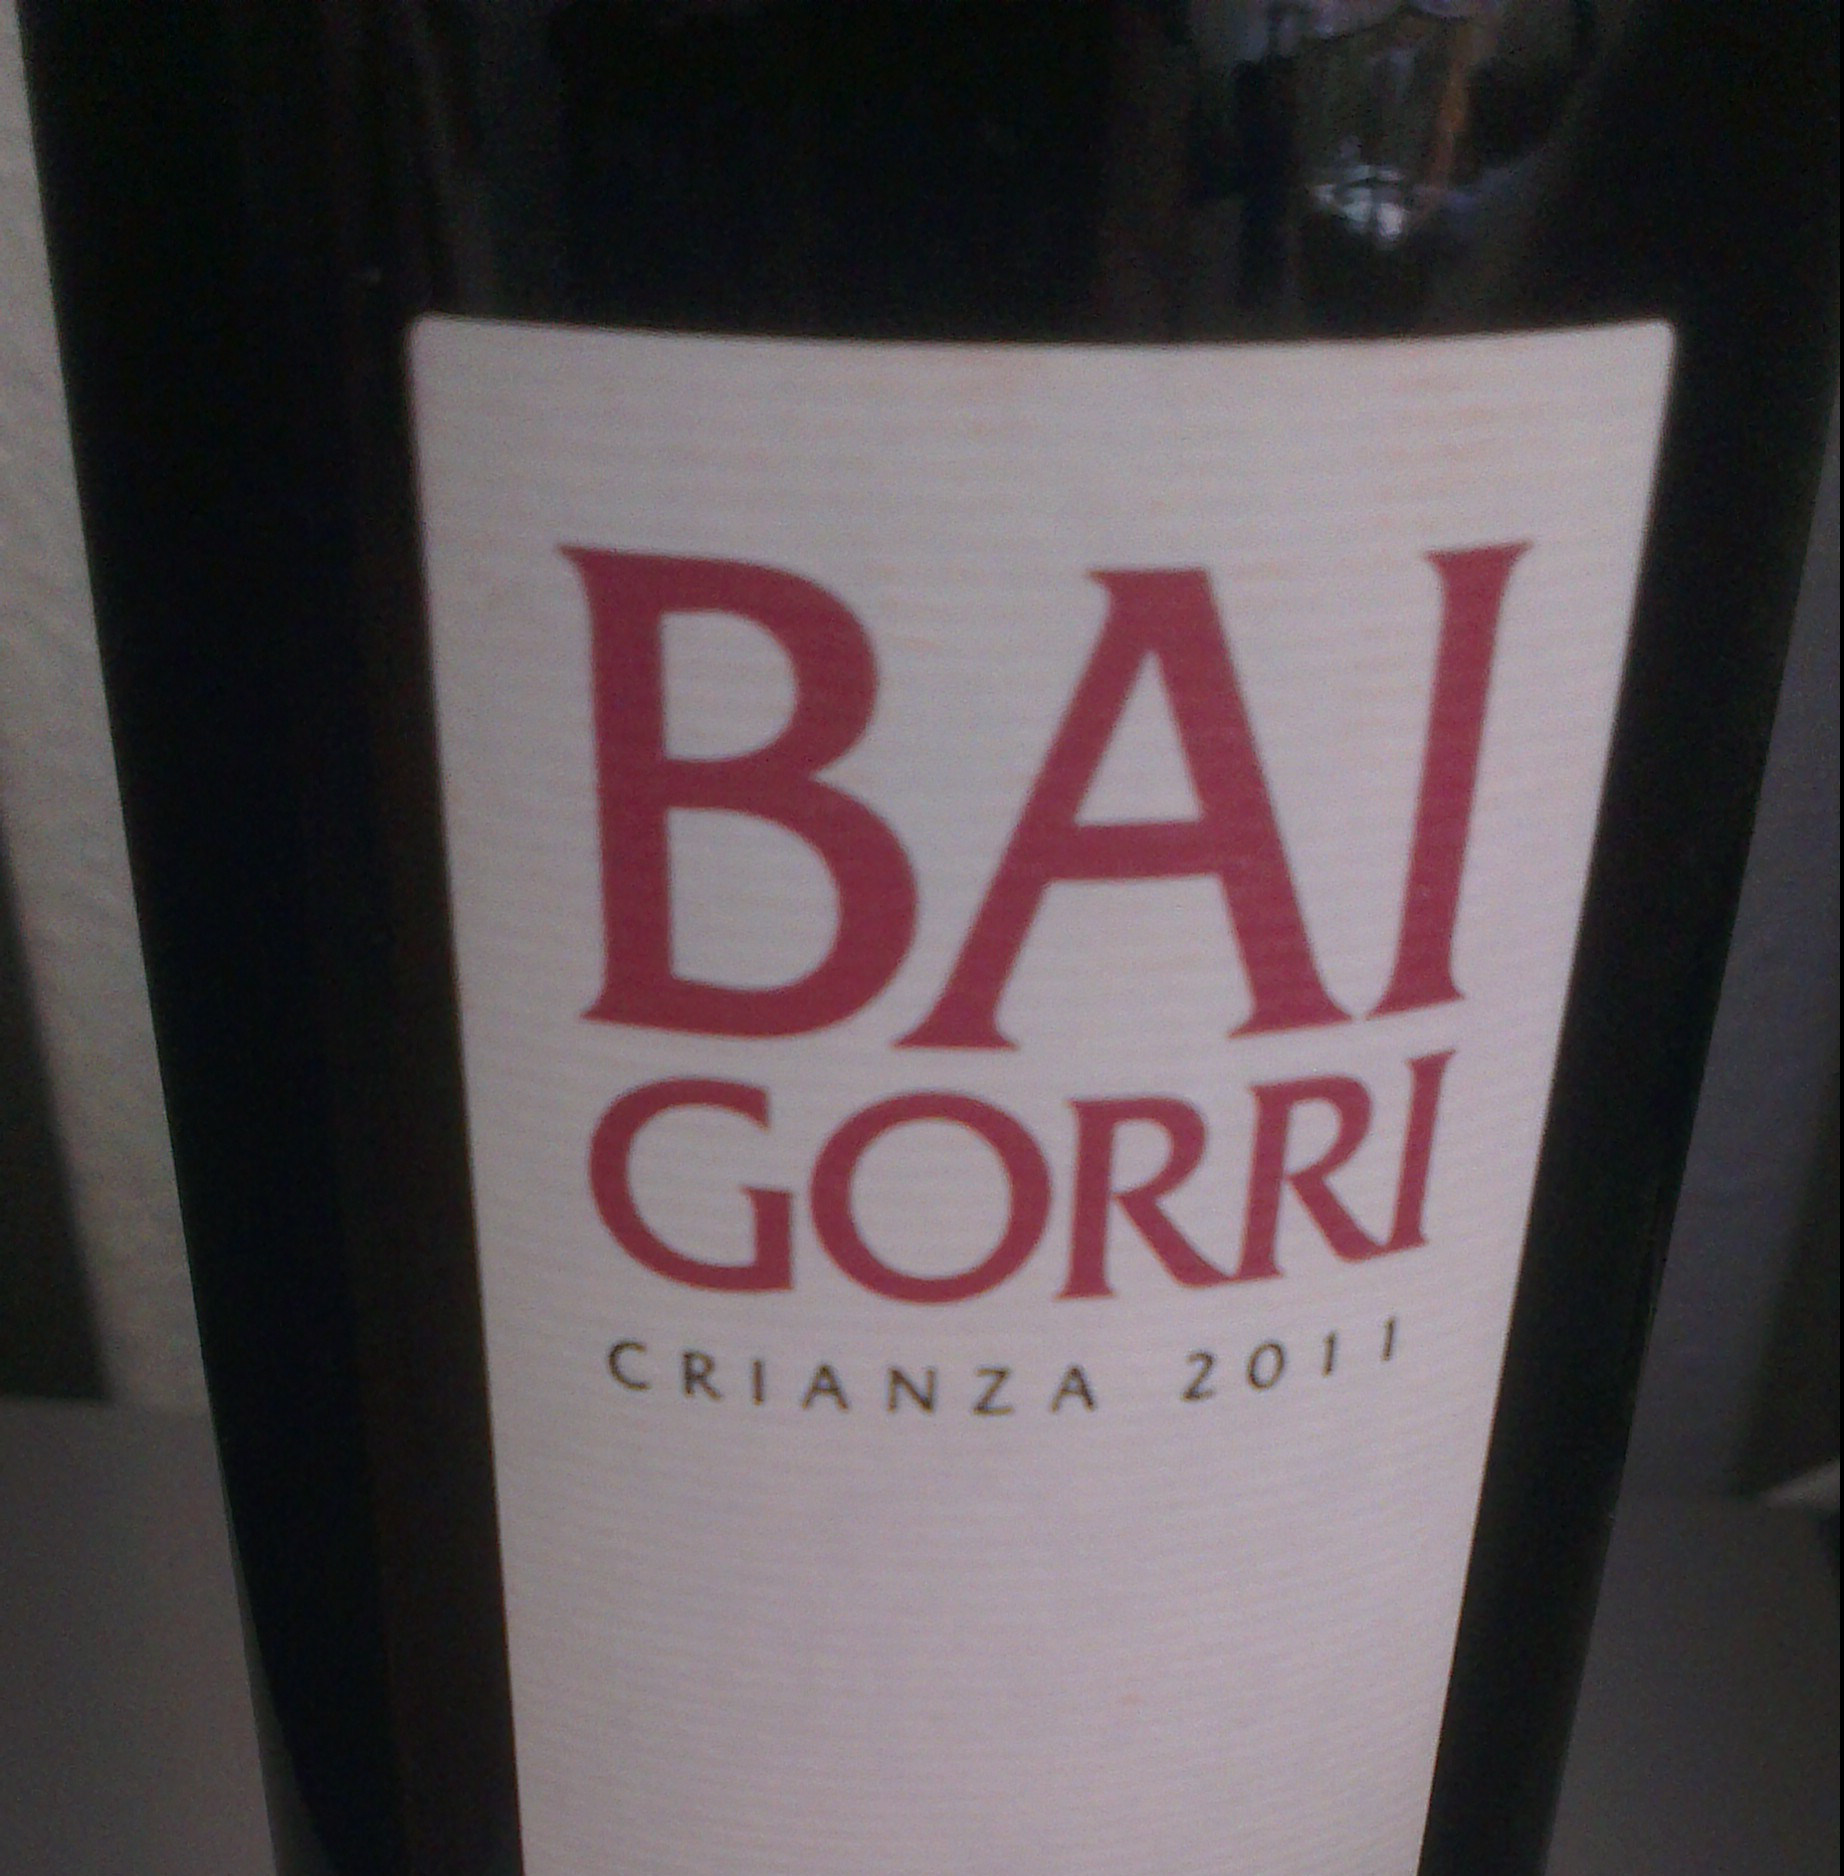 Baigorri crianza 2011, mucha fruta y madera de la Rioja Alavesa